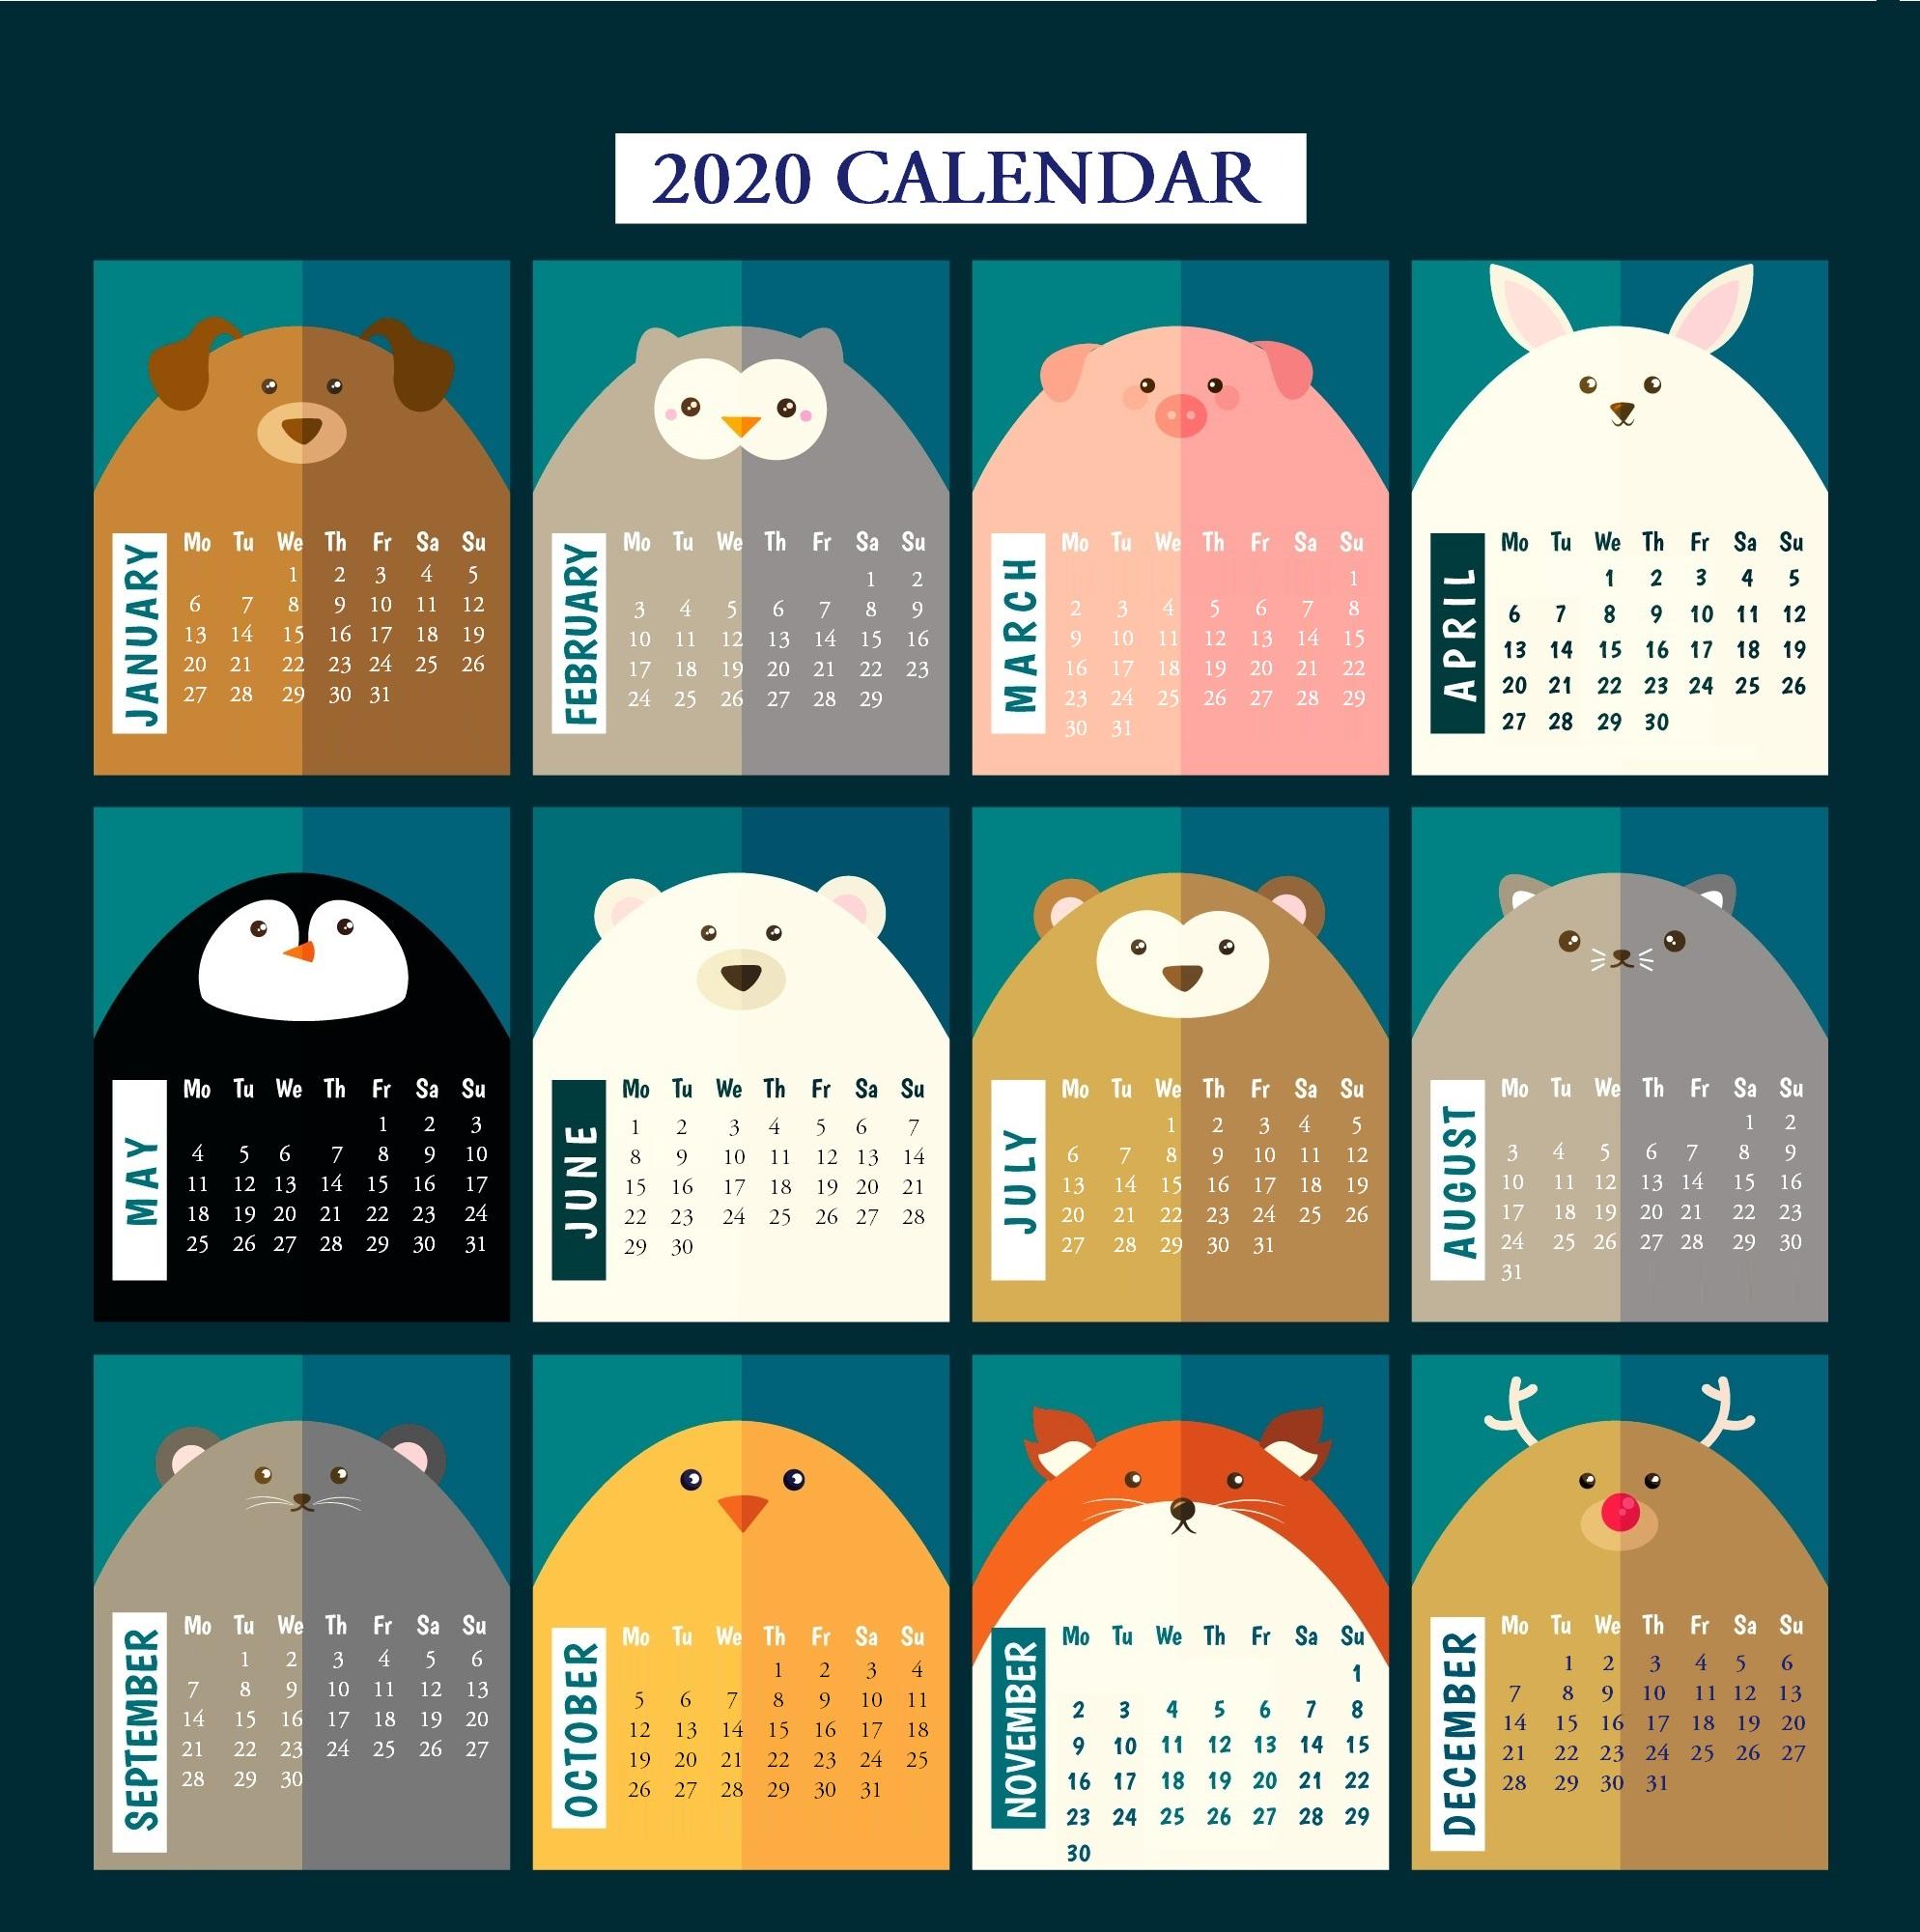 2020 Yearly Calendar Printable | Calendar 2020 regarding Cute Yearly Calendar Template